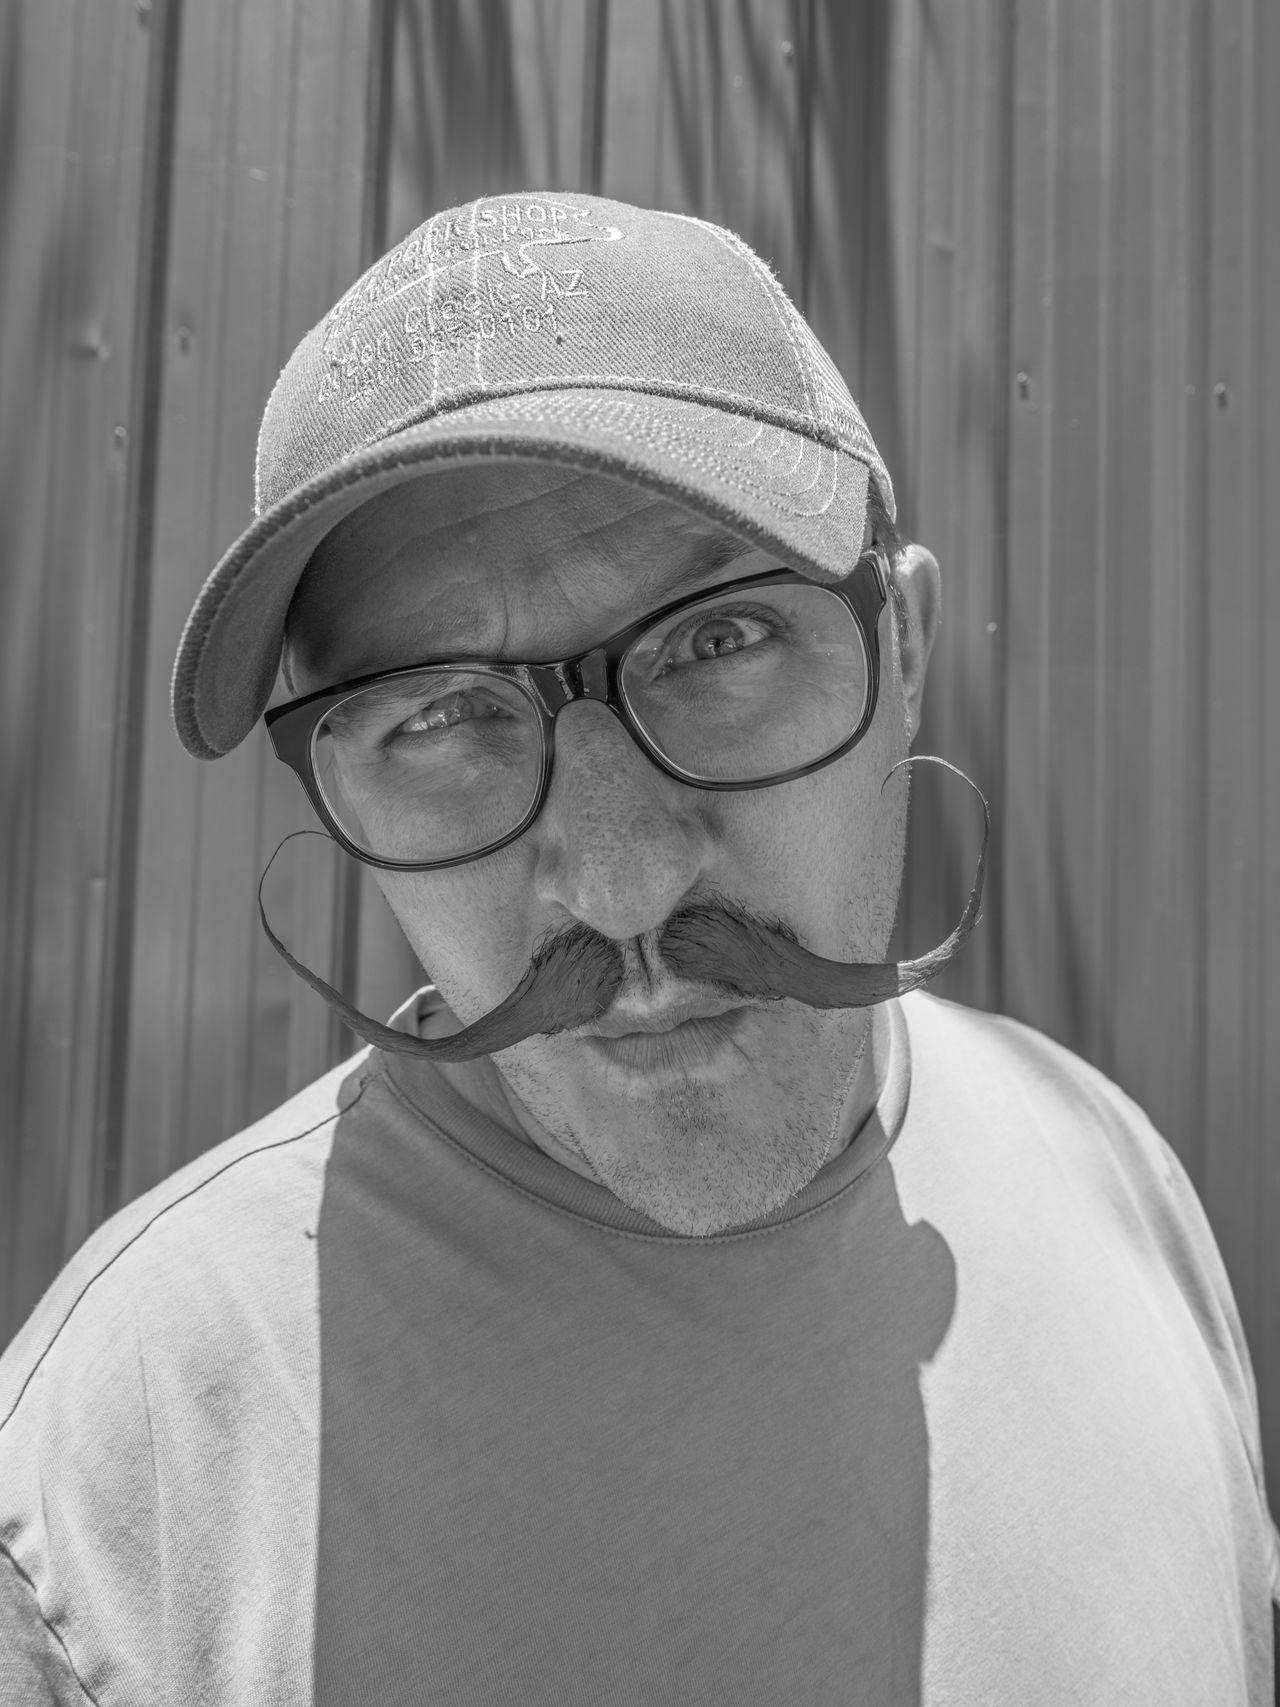 Beautiful stock photos of schnurrbart, eyeglasses, close-up, portrait, headshot